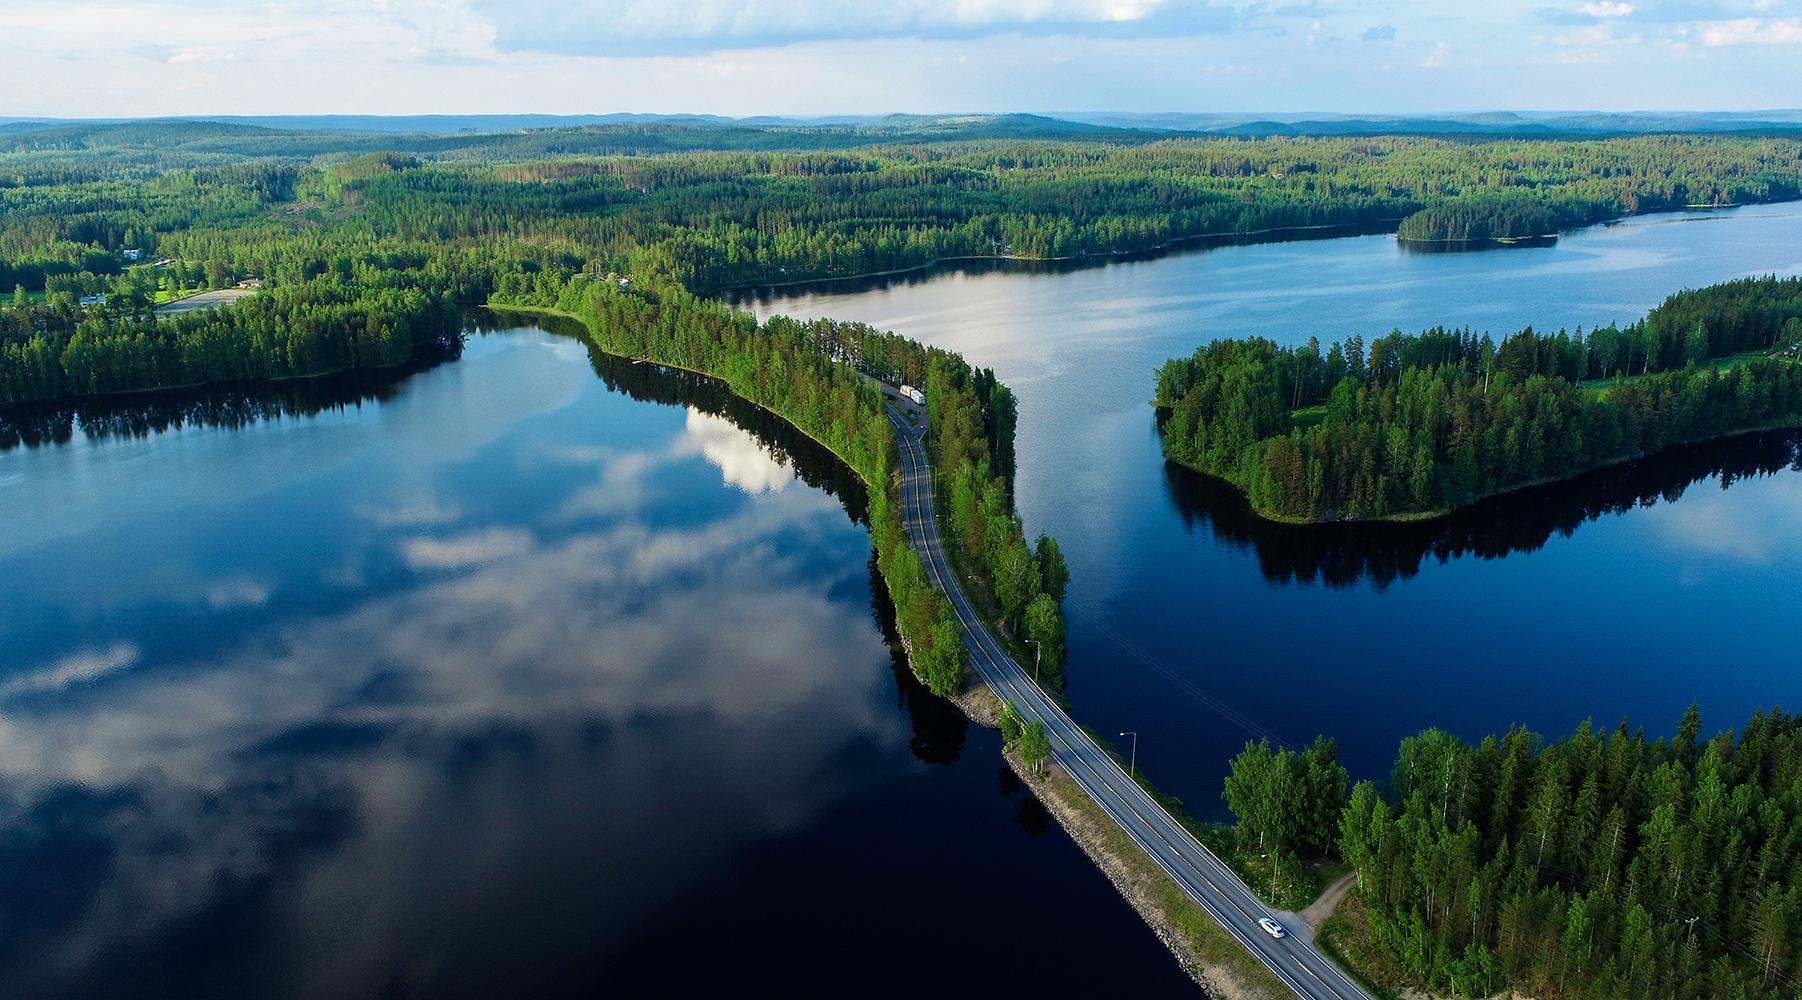 Valokuvaaja Timo Ahola - Drone-ilmakuvaus - Harjunsalmi - Ilmakuva (c) Valokuvaaja Timo Ahola